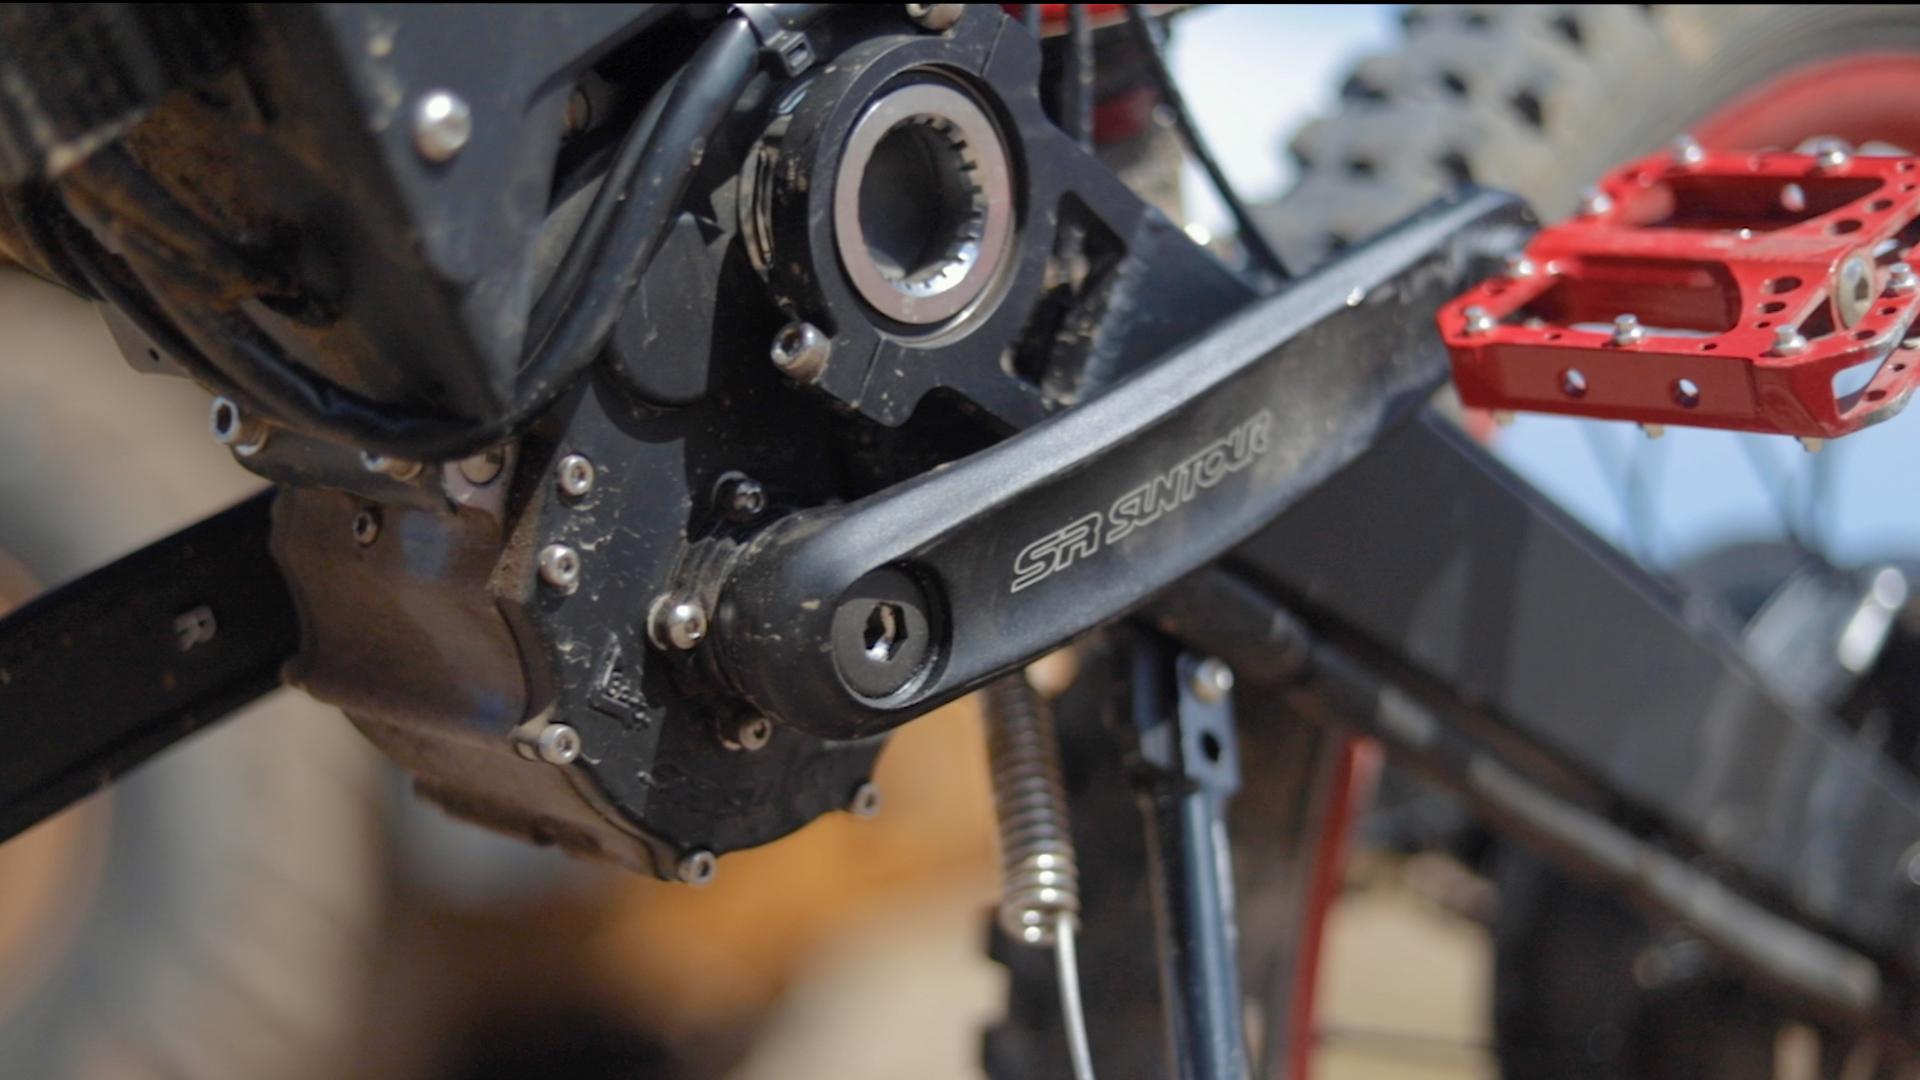 electrified-reviews-stealth-b52-bomber-electric-bike-review-vboxx.jpg